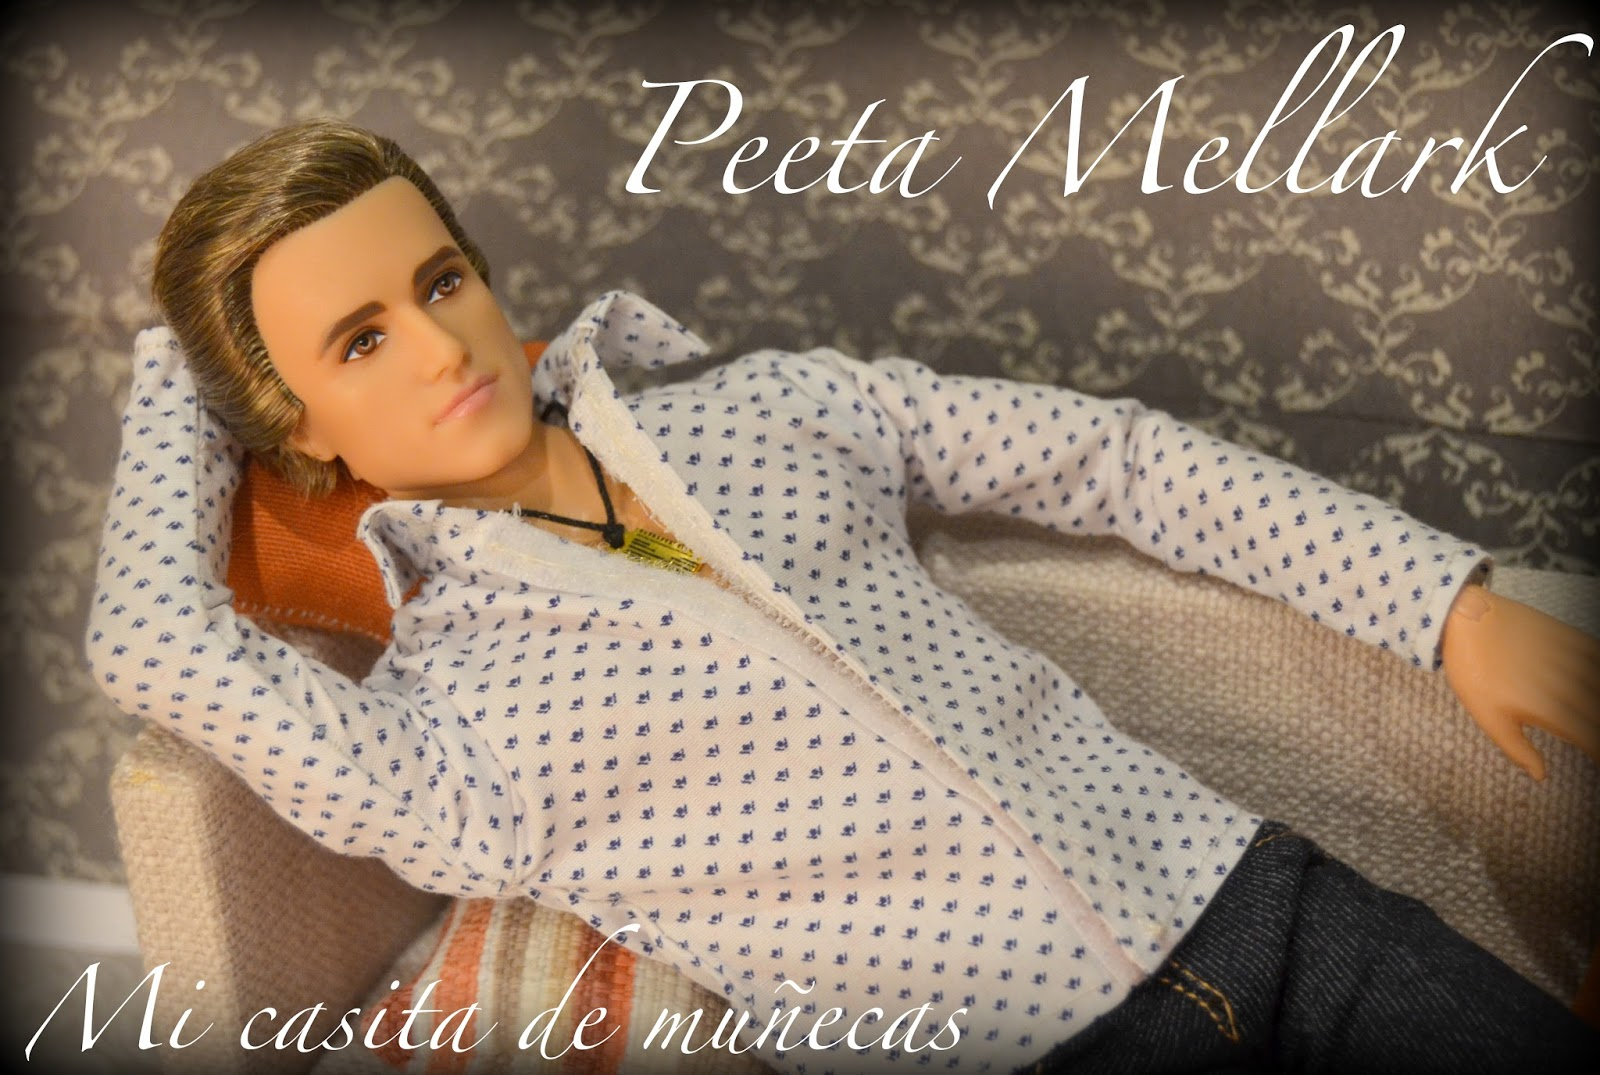 Peeta Mellark, Los juegos del hambre, The hunger games, Ken Peeta, En llamas.